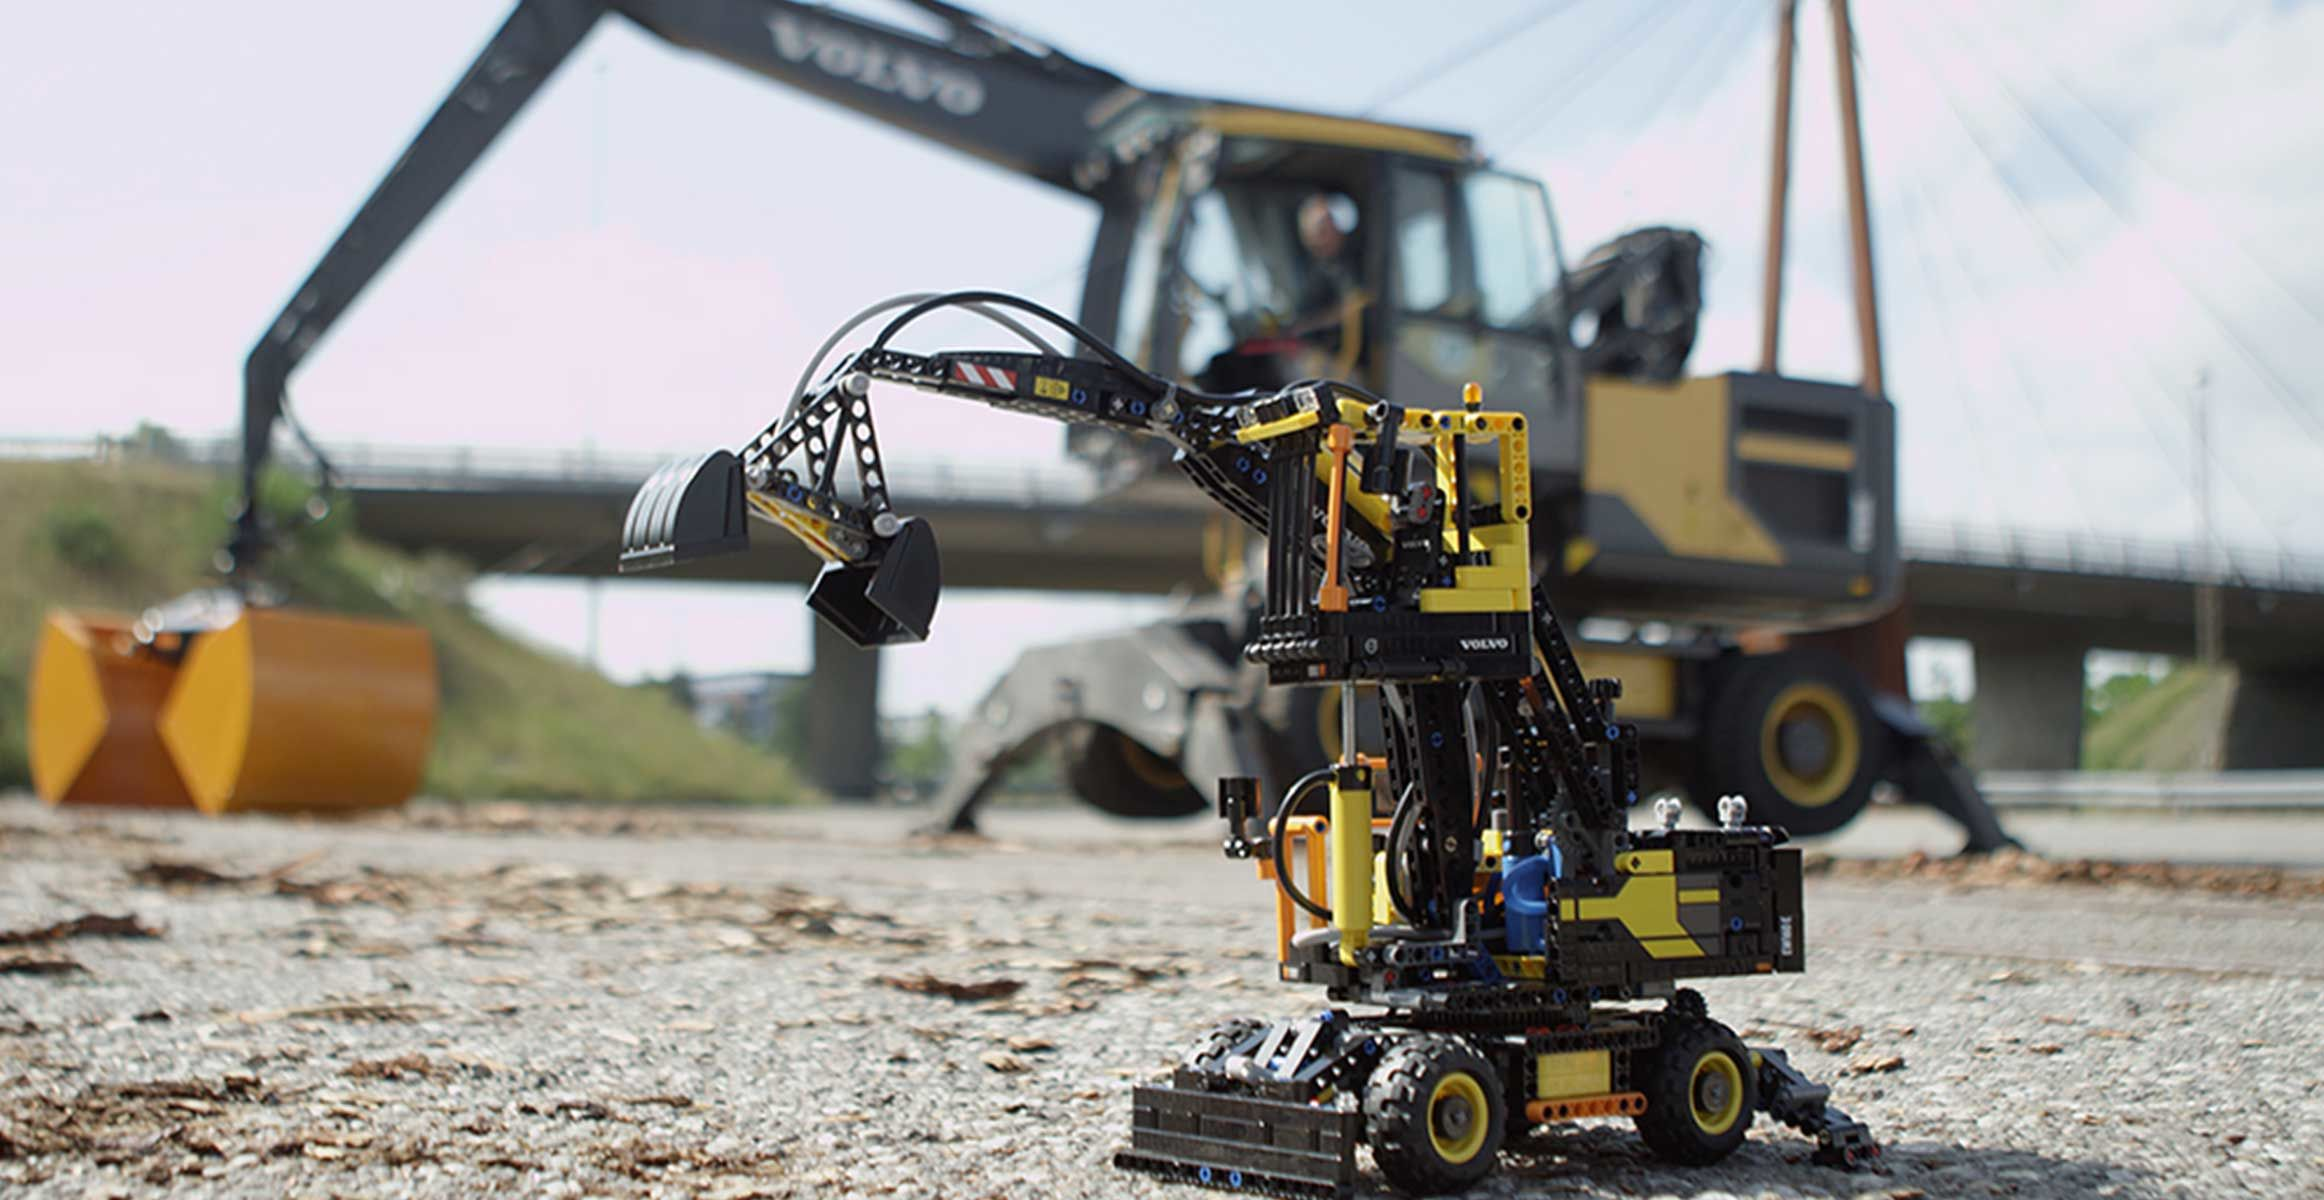 Lego 174 Technic Builds Air Powered Mini Wheeled Excavator